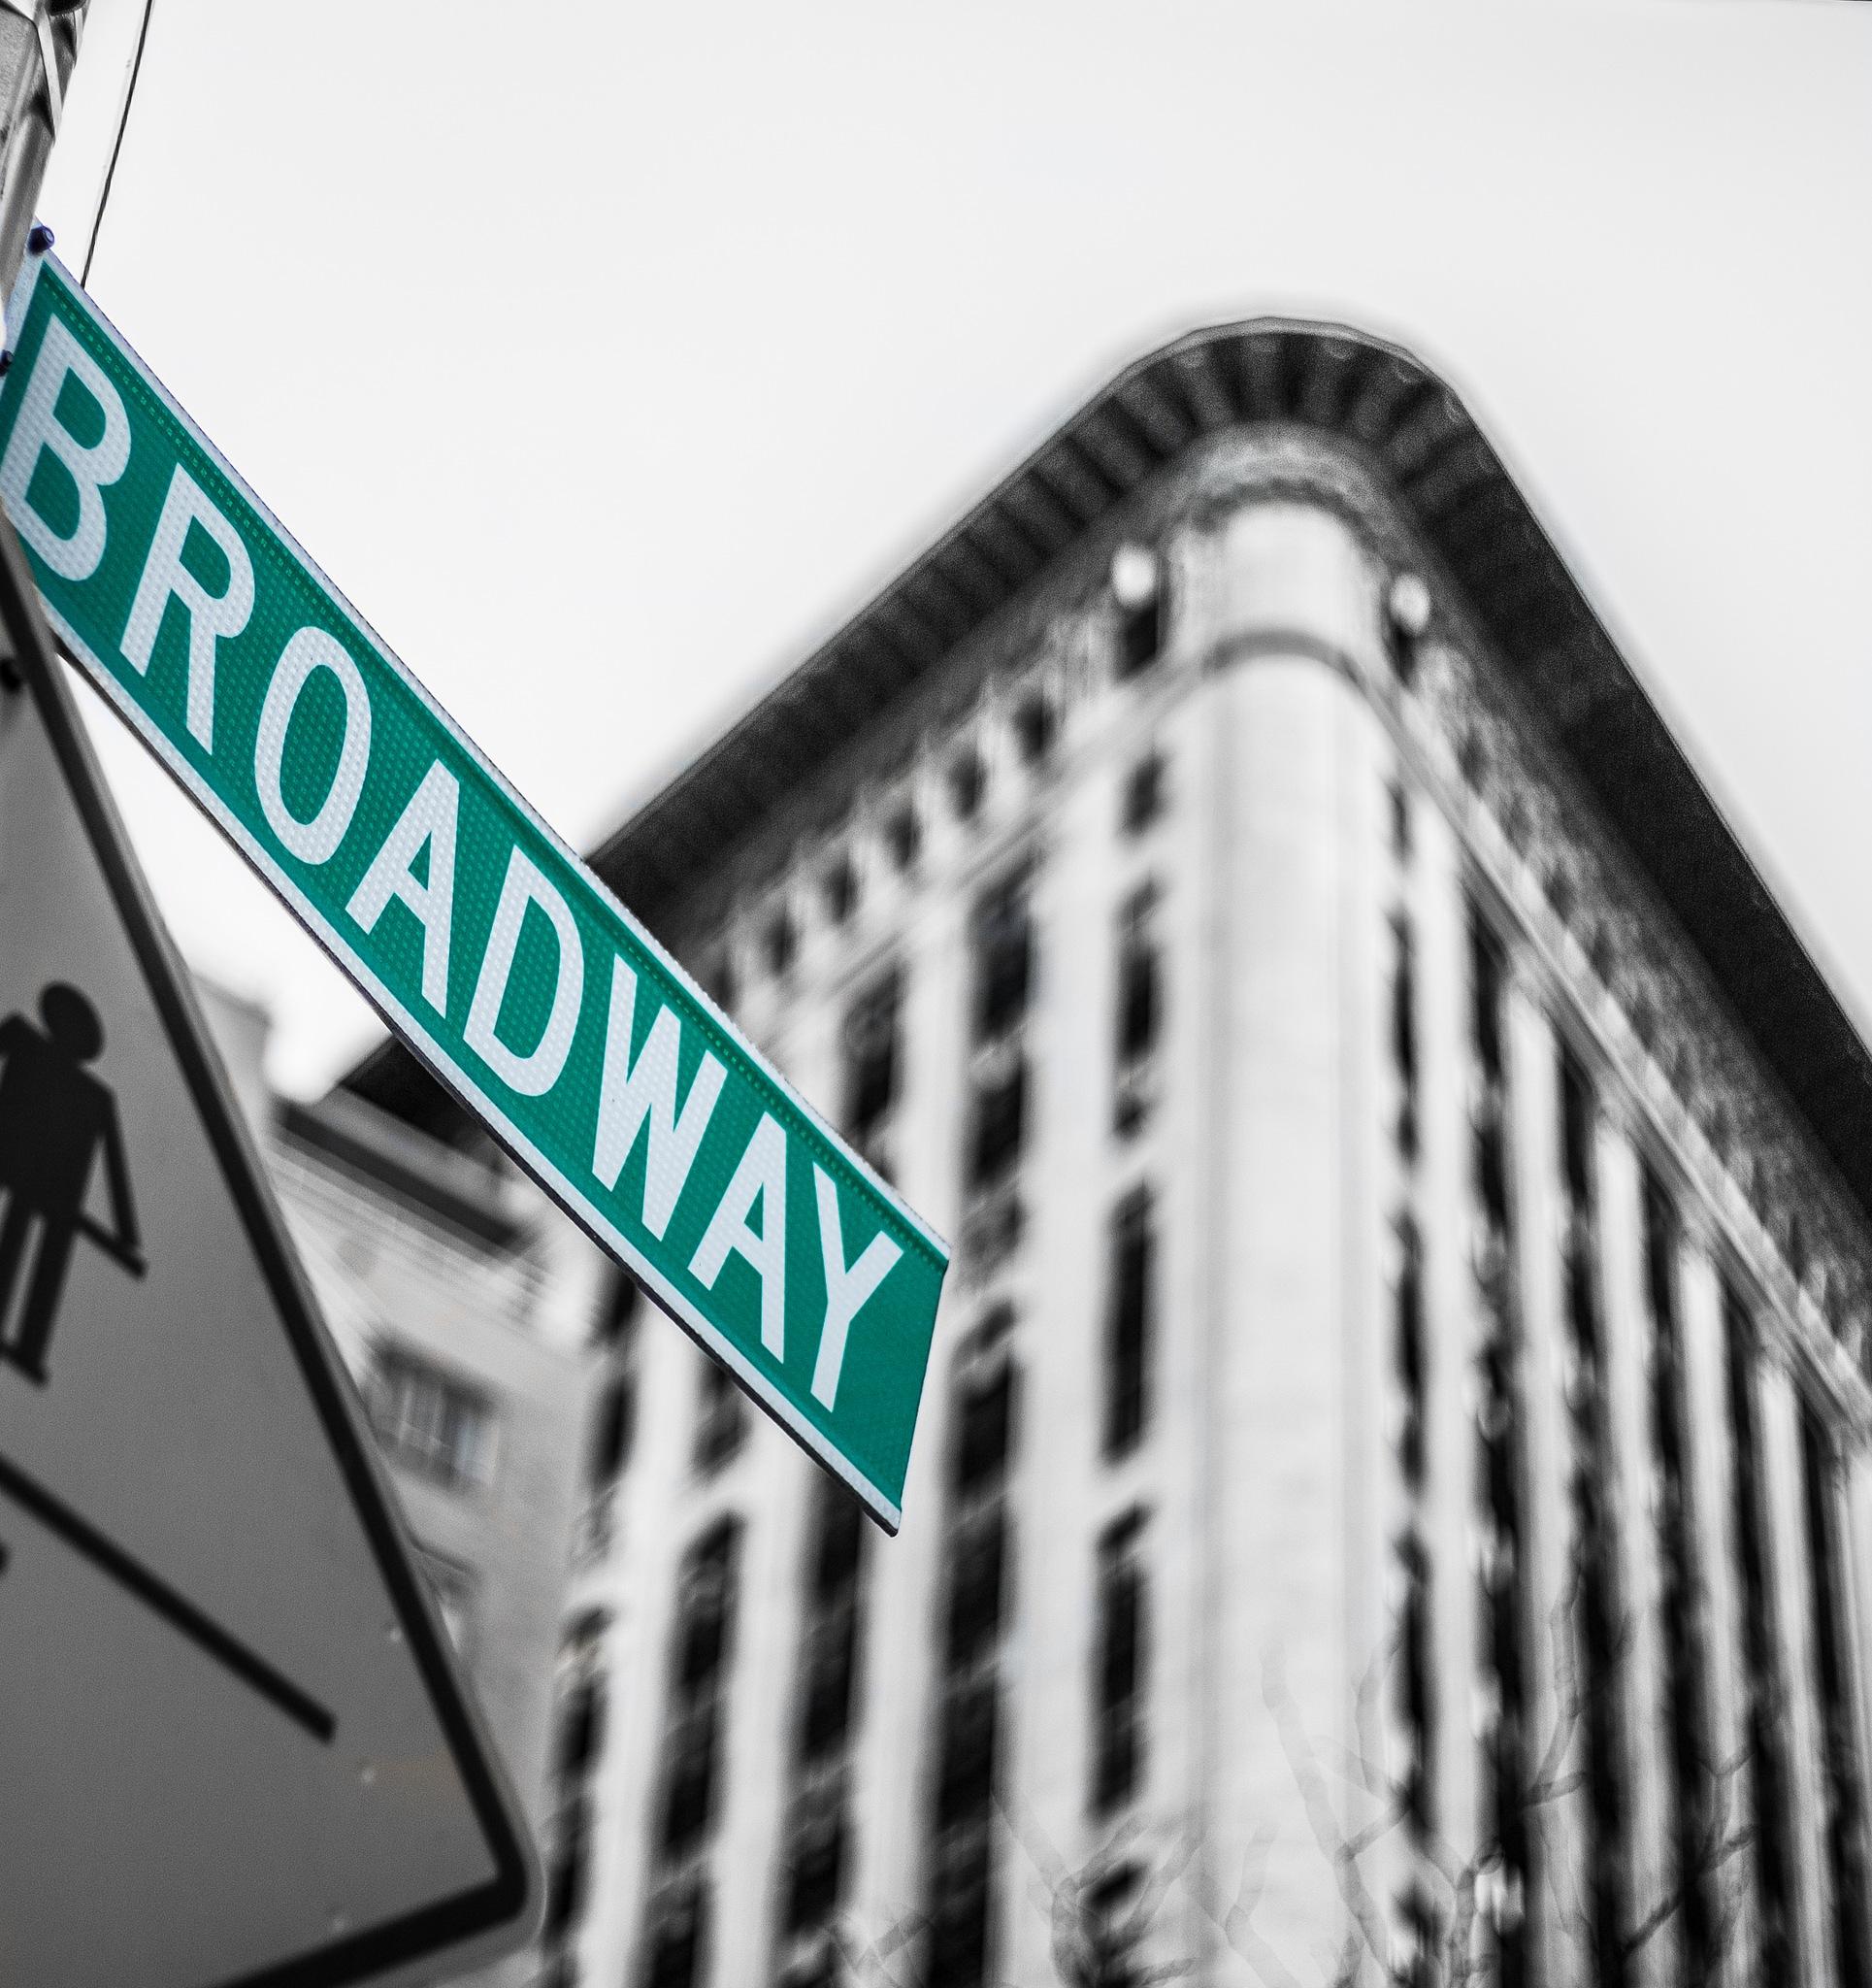 New York City by Piotr Krzeminski